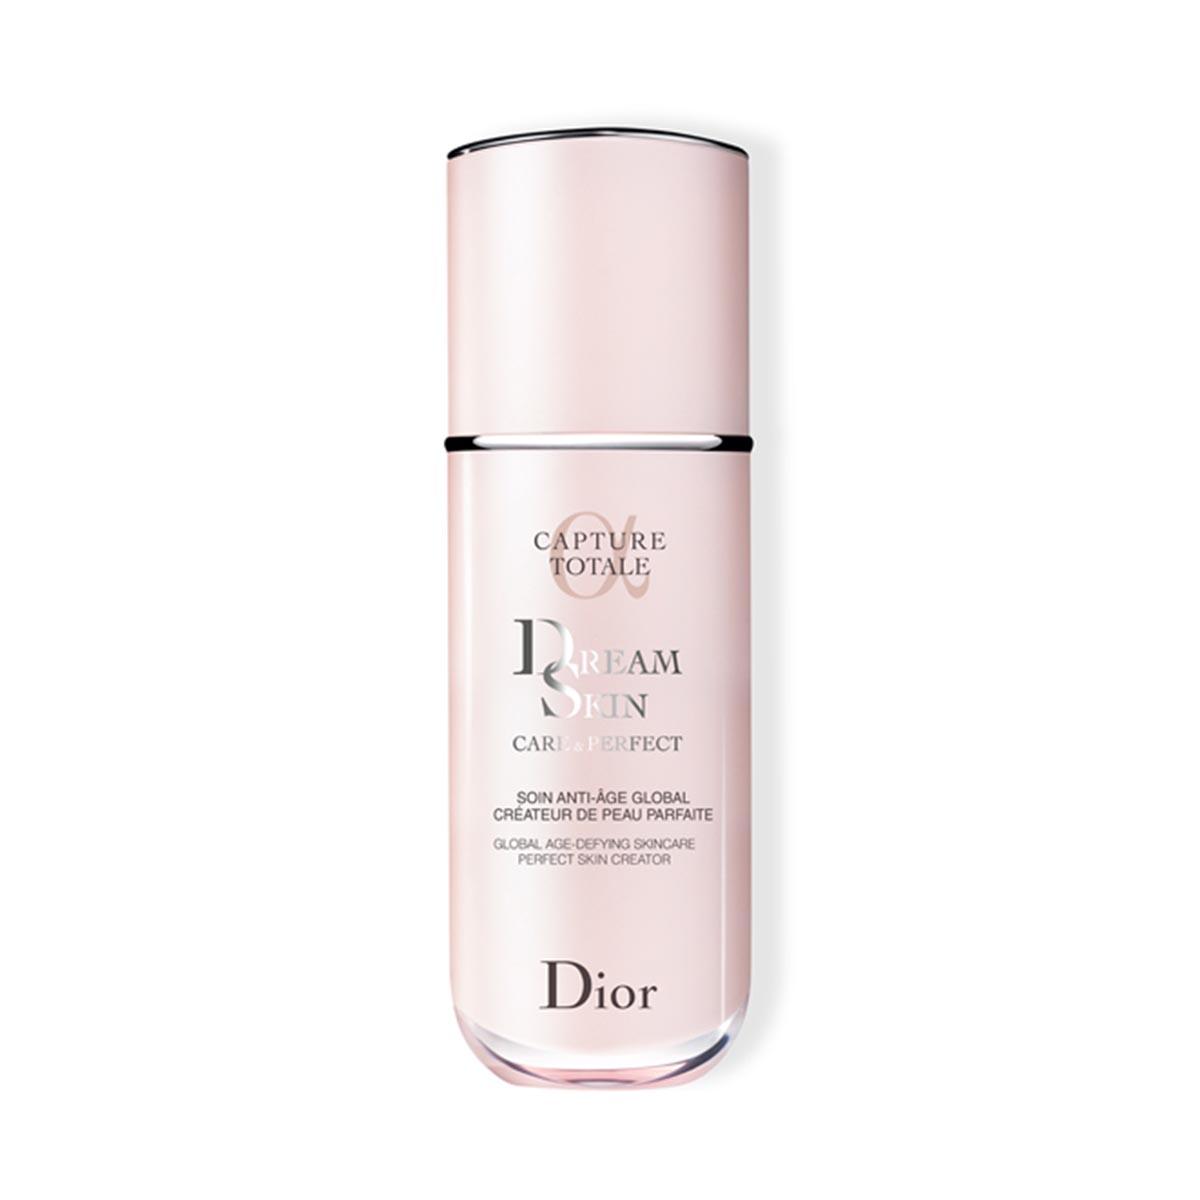 Dior capture total dream skin care perfect 50ml